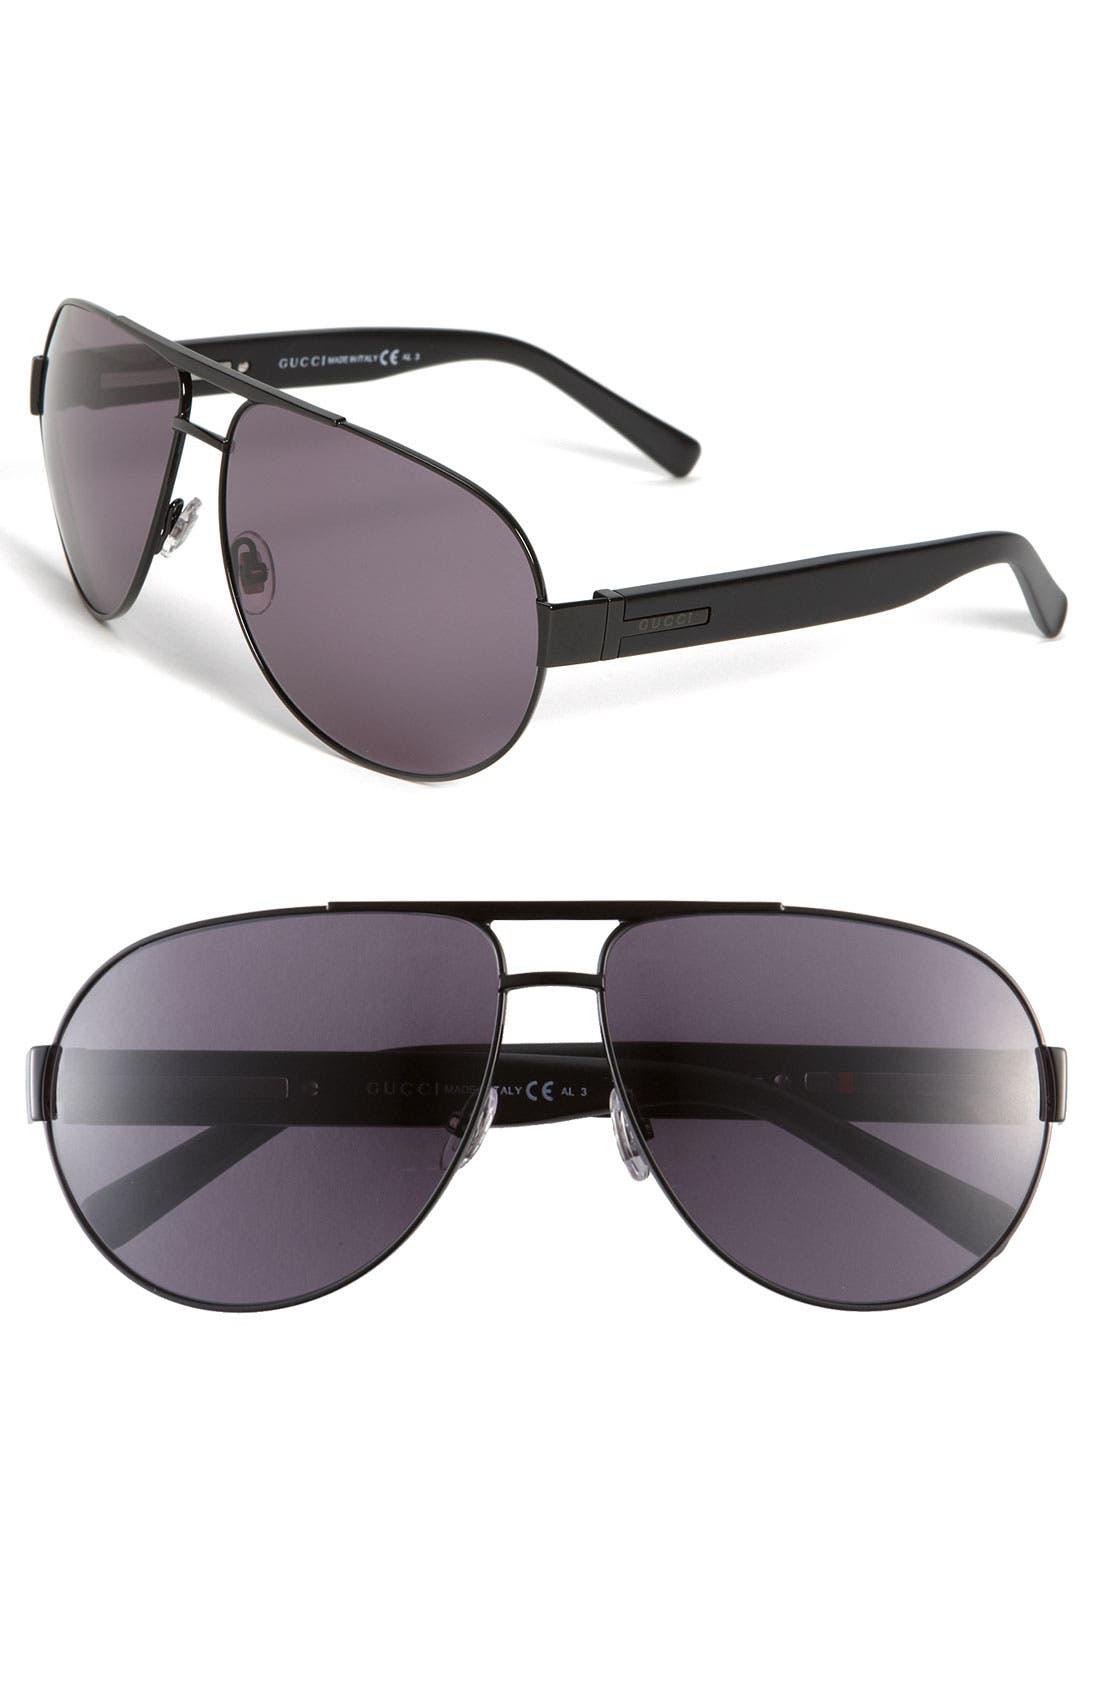 Main Image - Gucci Stainless Steel Aviator Sunglasses